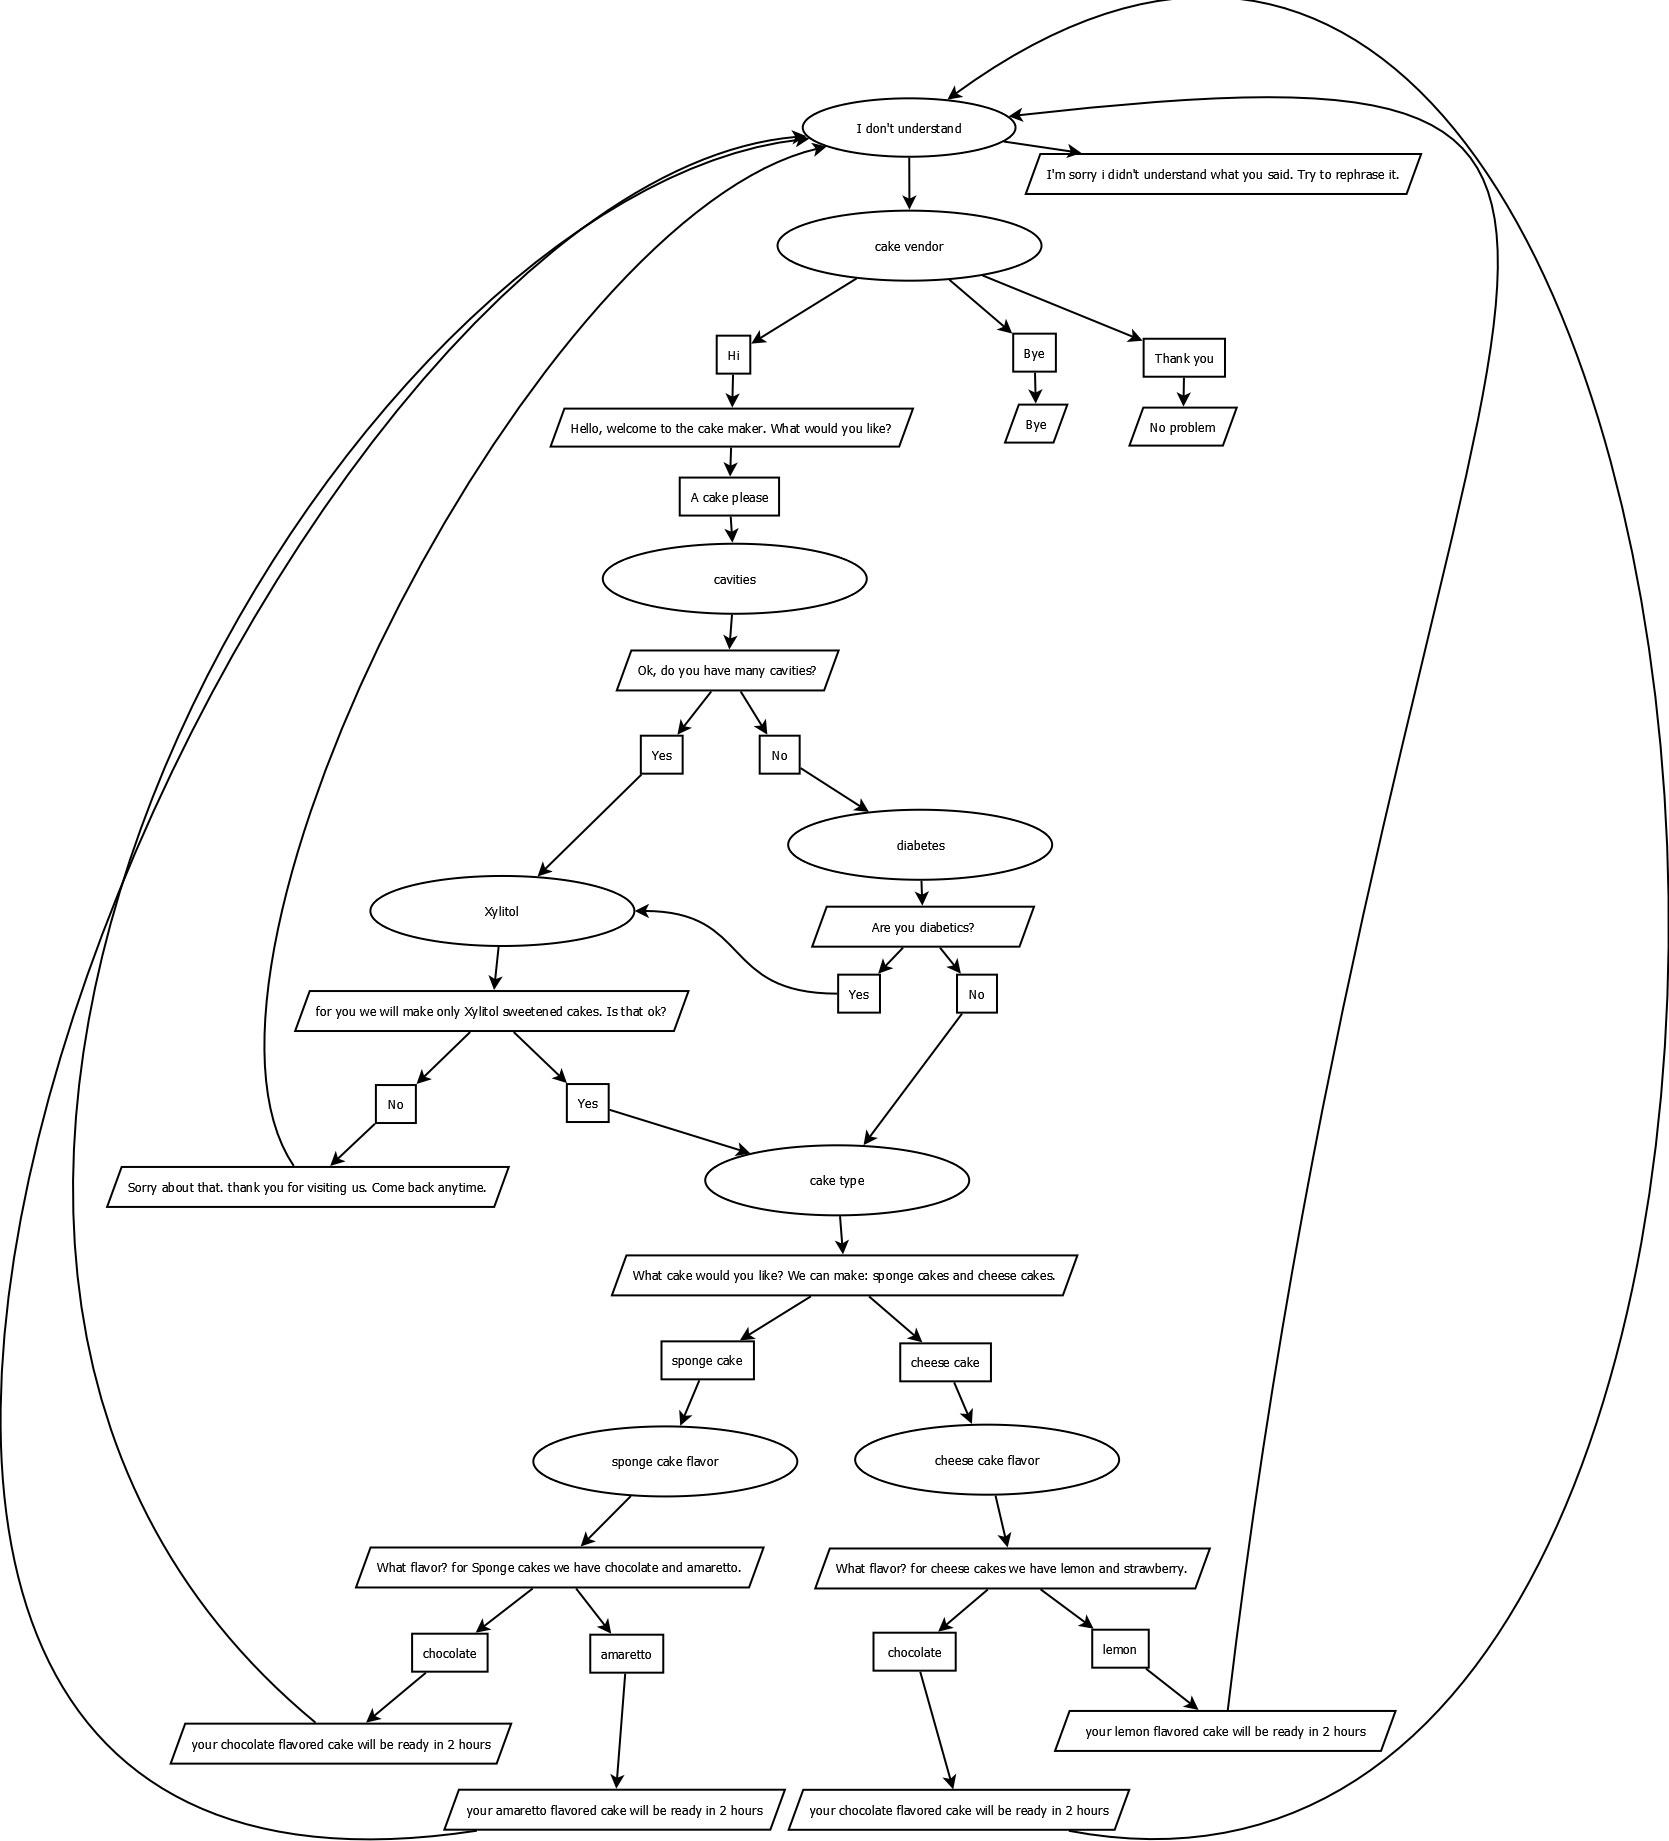 Creating a New Virtual Human with the NPCEditor - VHToolkit